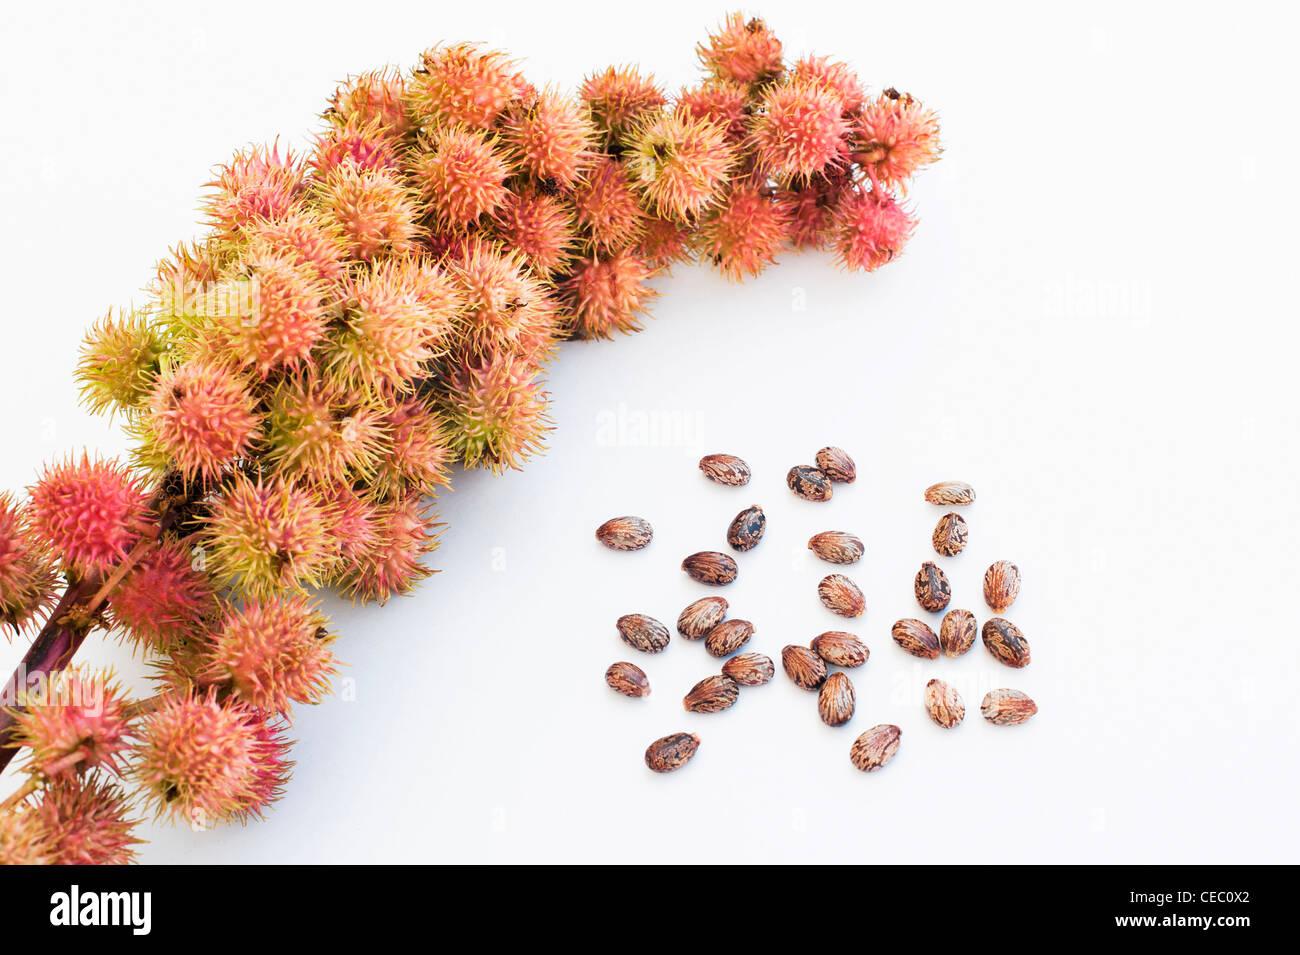 Ricinus communis. Castor oil fruit and seeds on white background - Stock Image